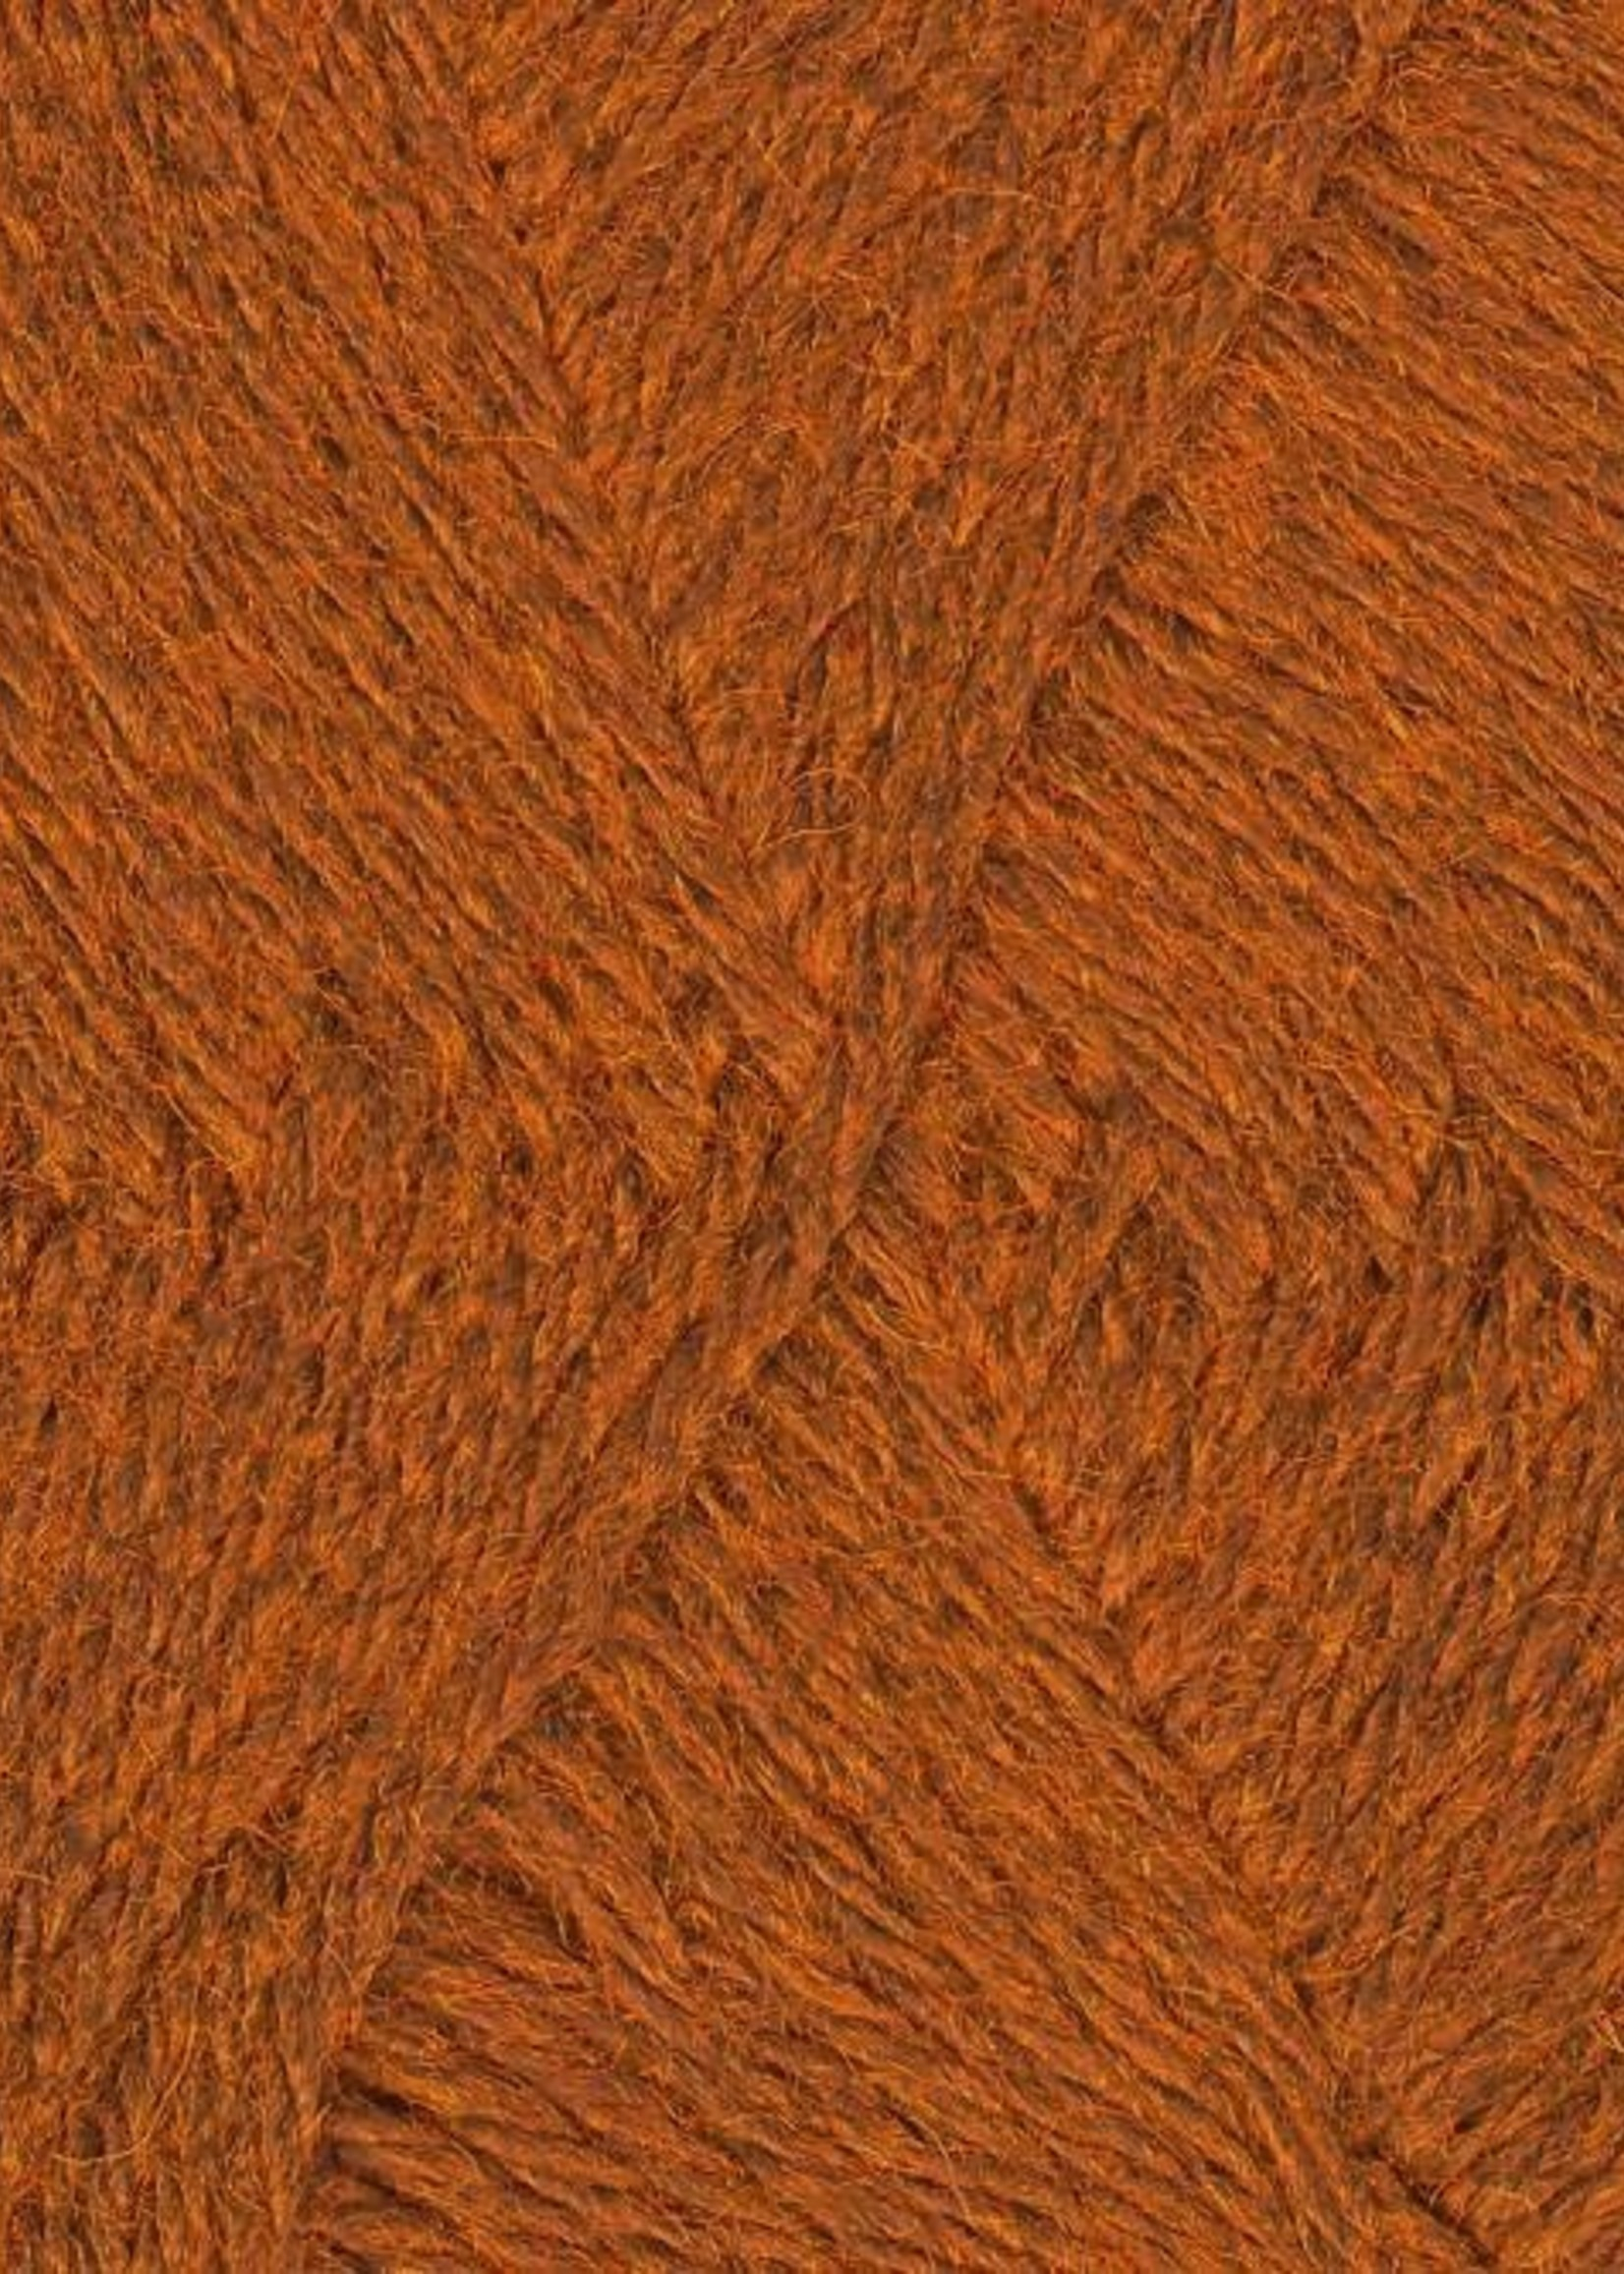 Knitting Fever KFI Collection Teenie Weenie Wool - Pumpkin